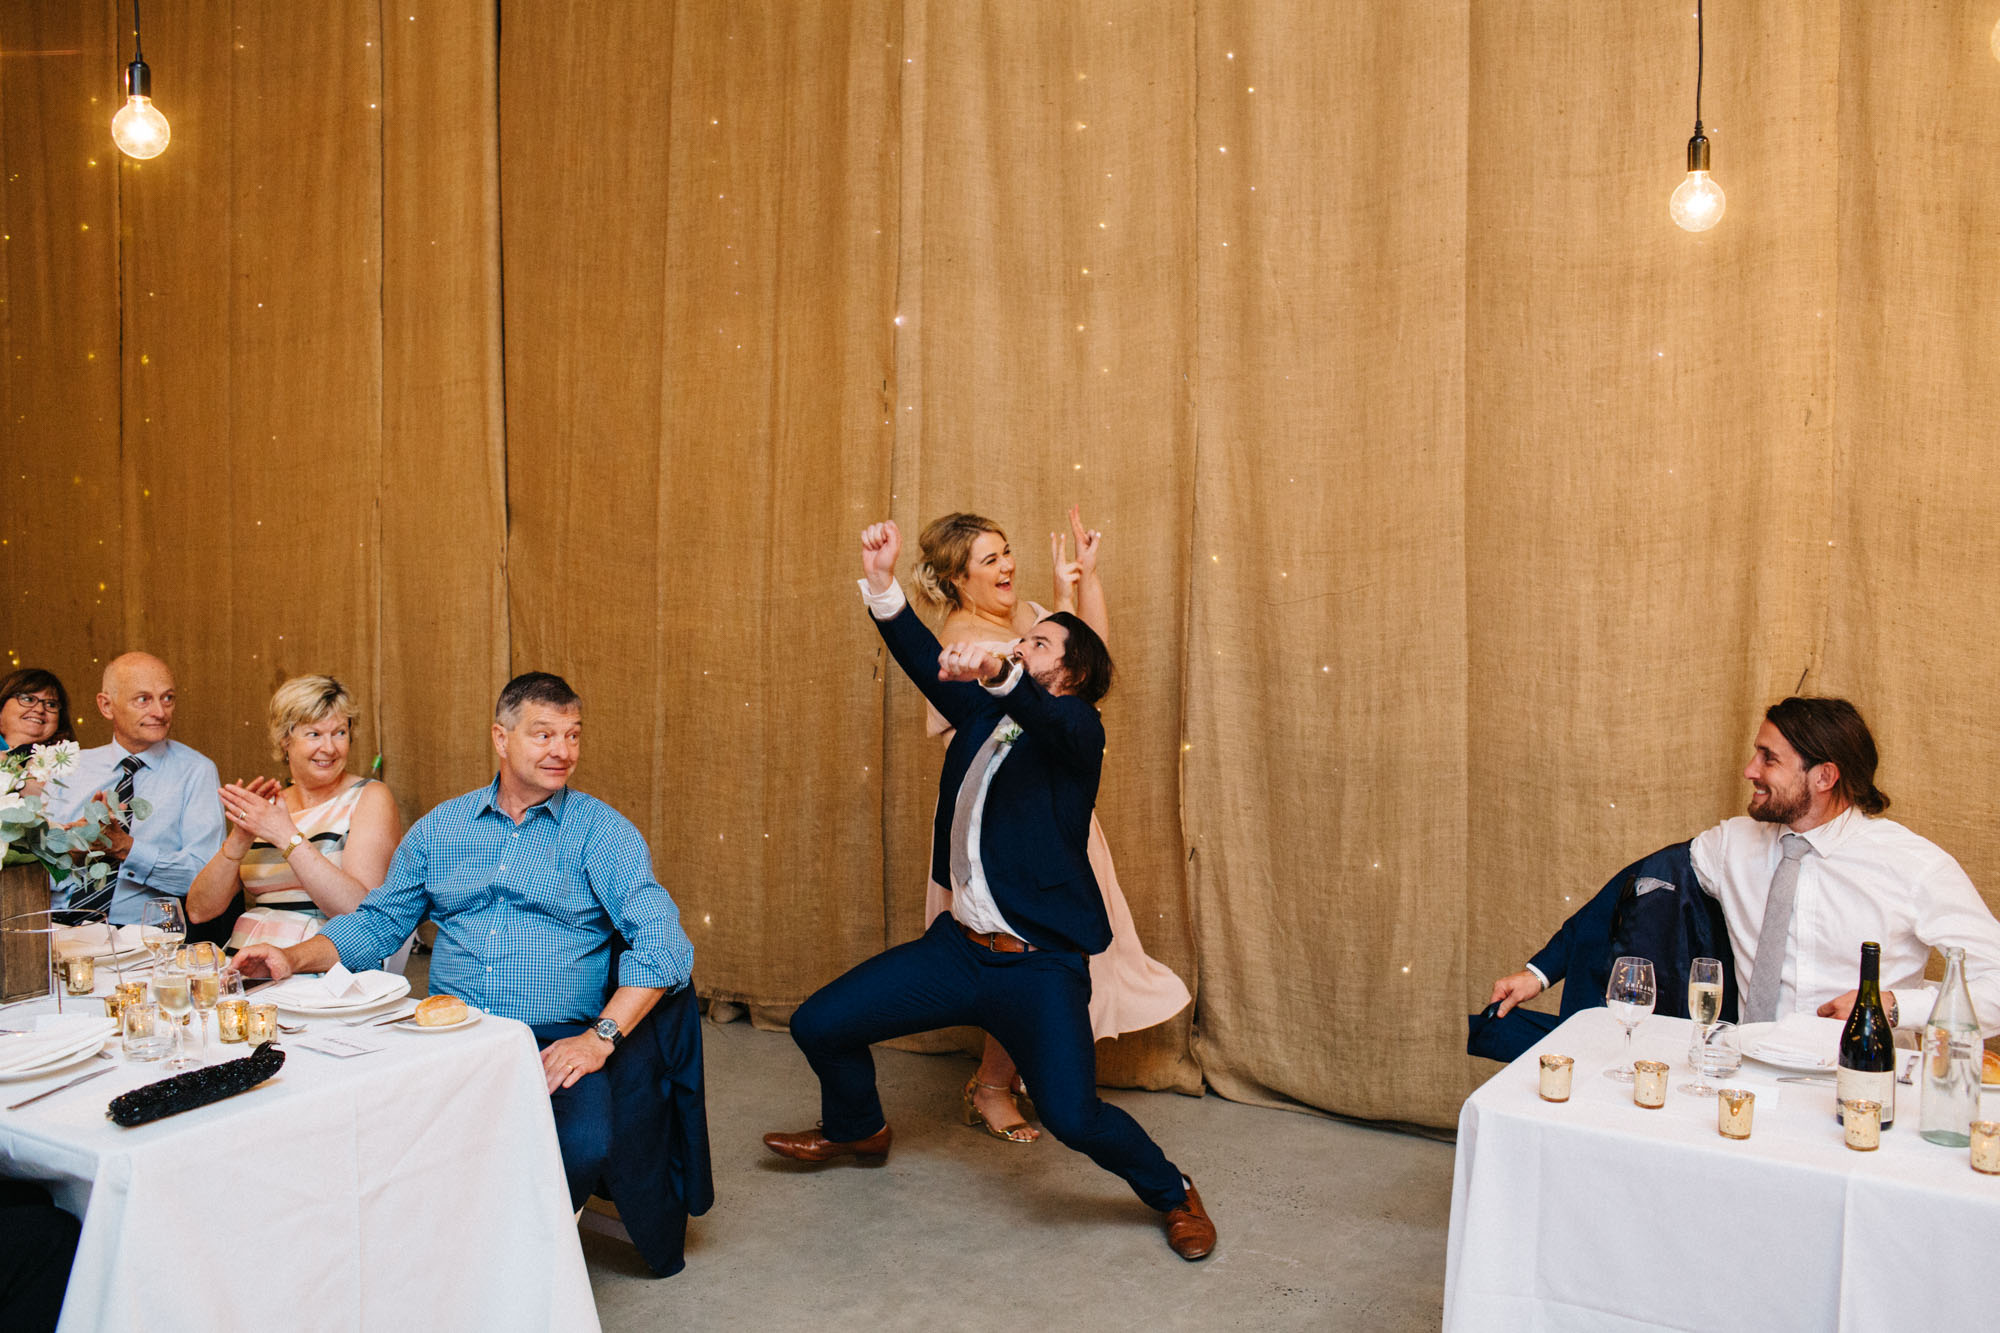 Golding-Wines-wedding-photography-095.jpg